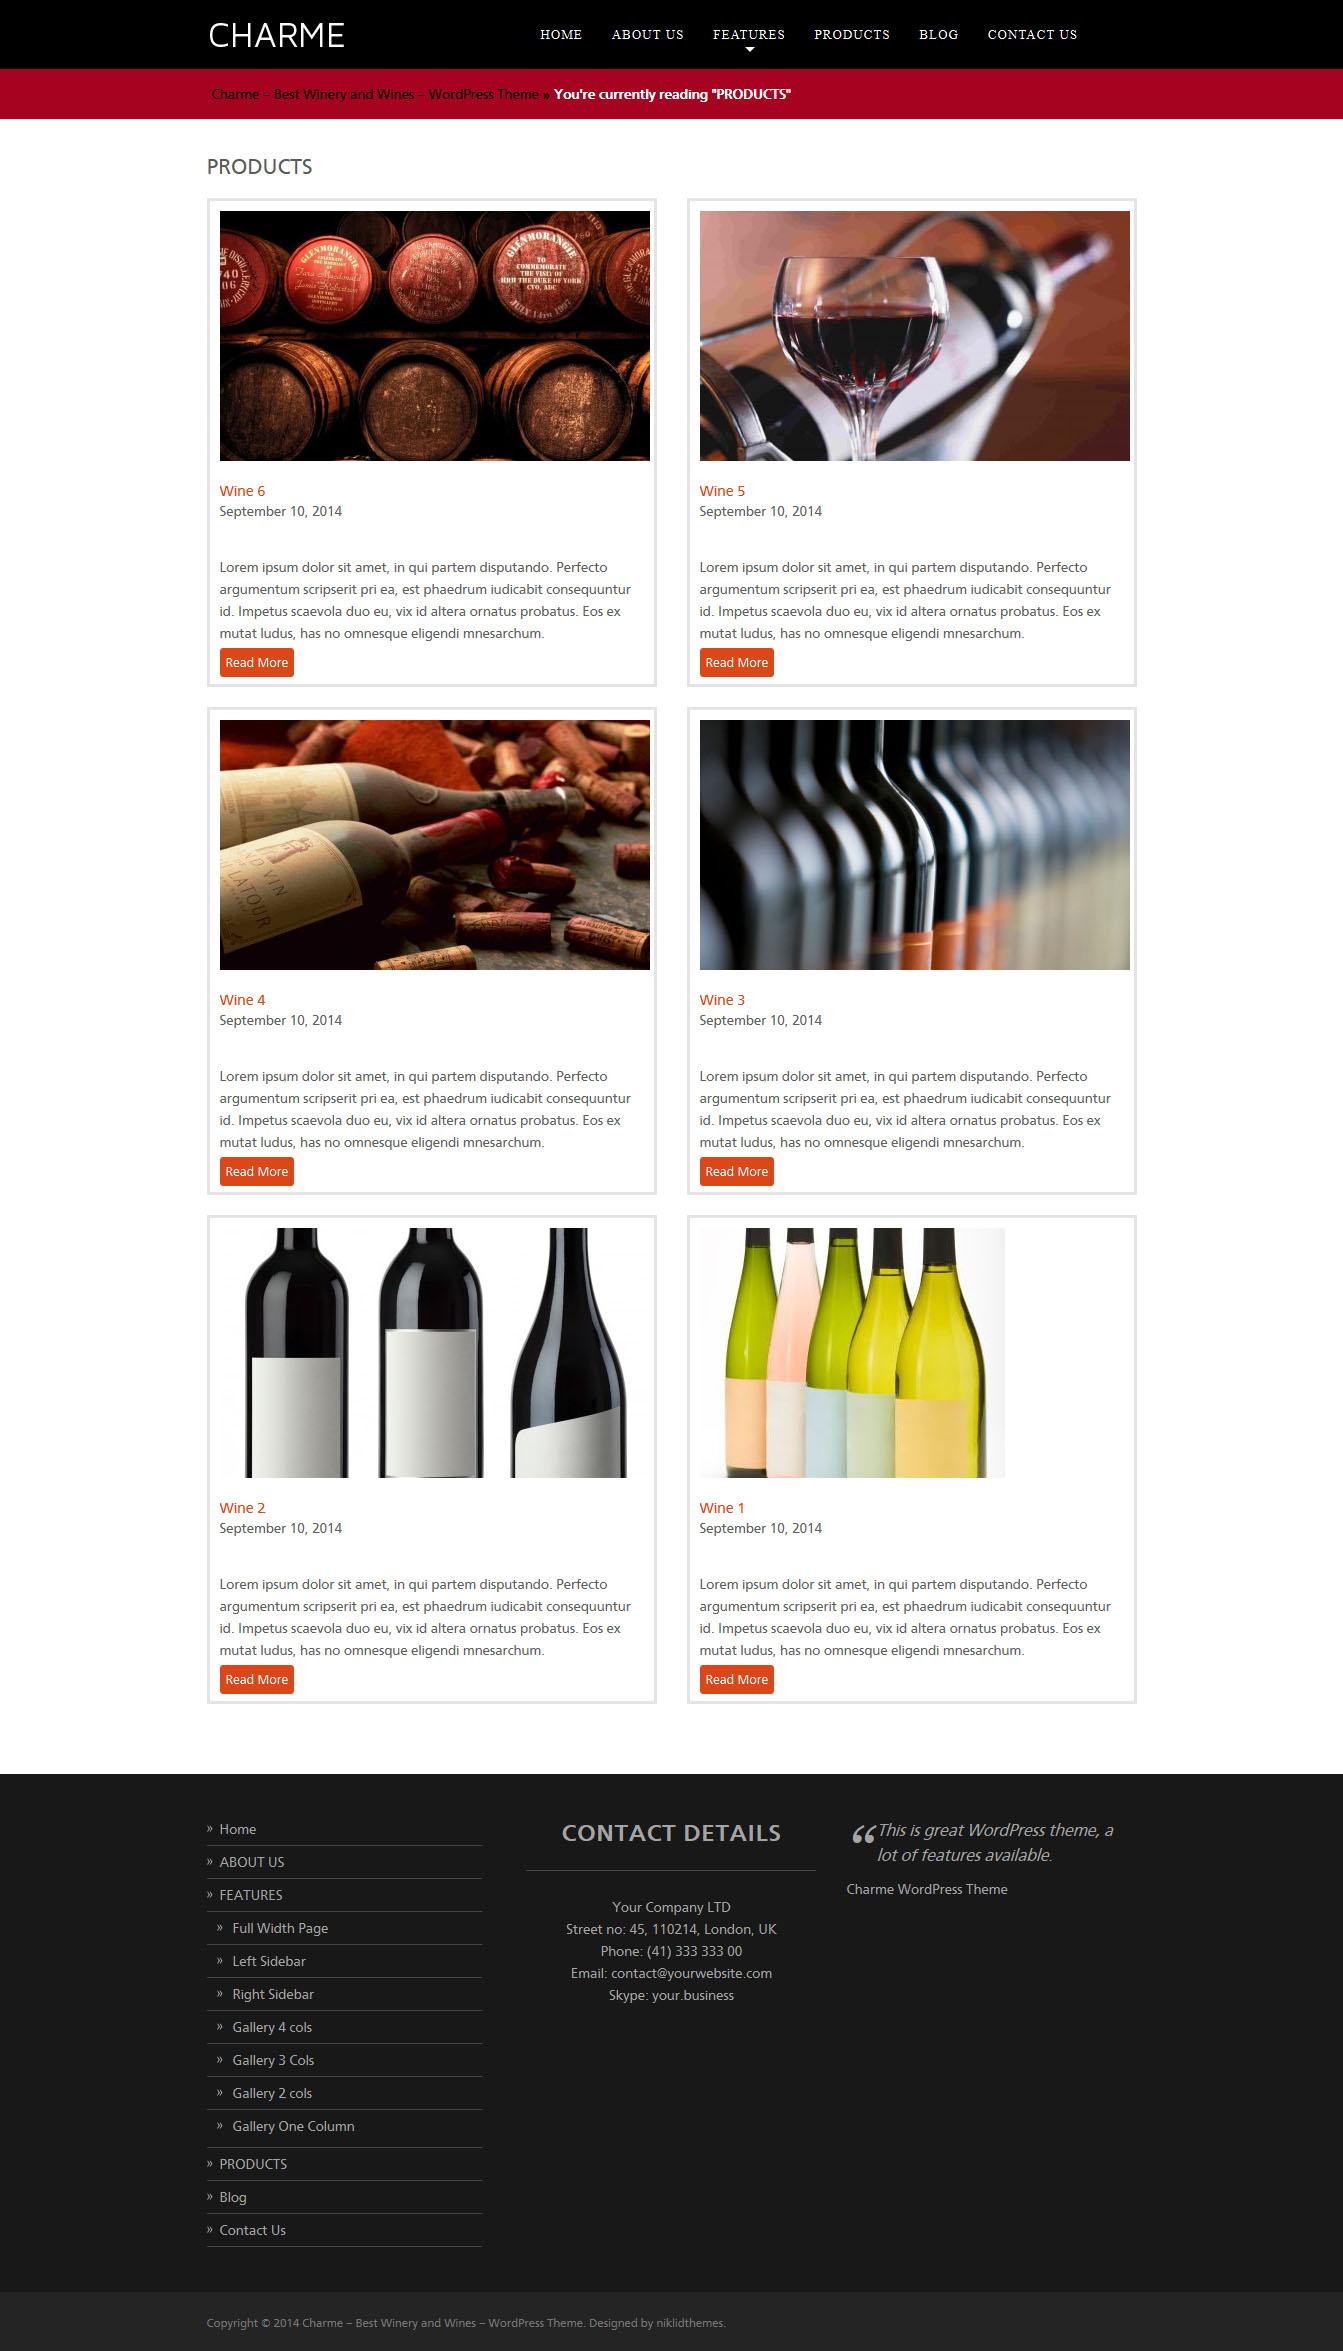 Charme Winery And Wines Wordpress Theme Wordpress